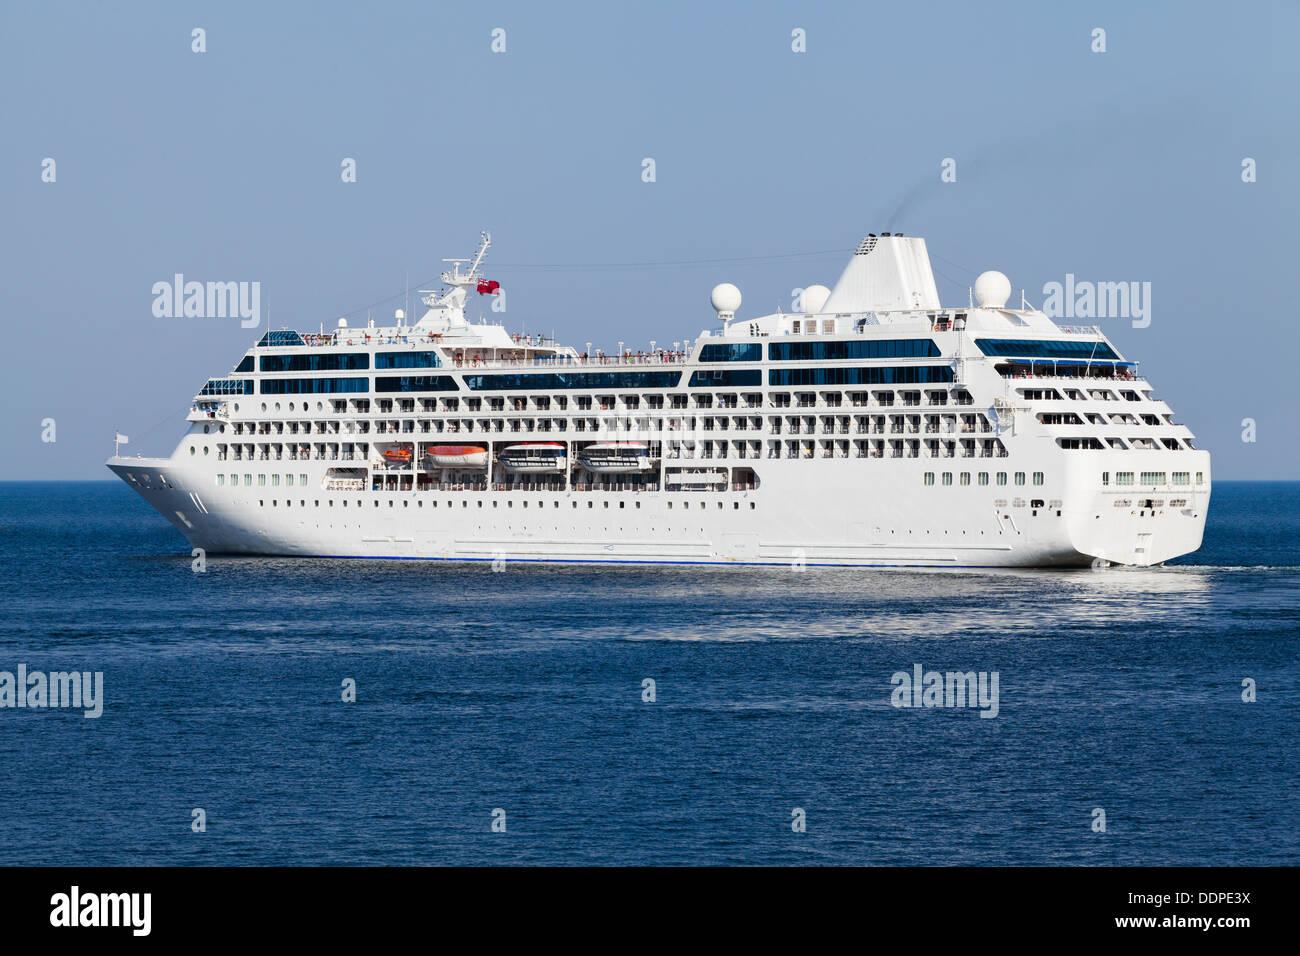 passenger ship afloat side leaving - Stock Image